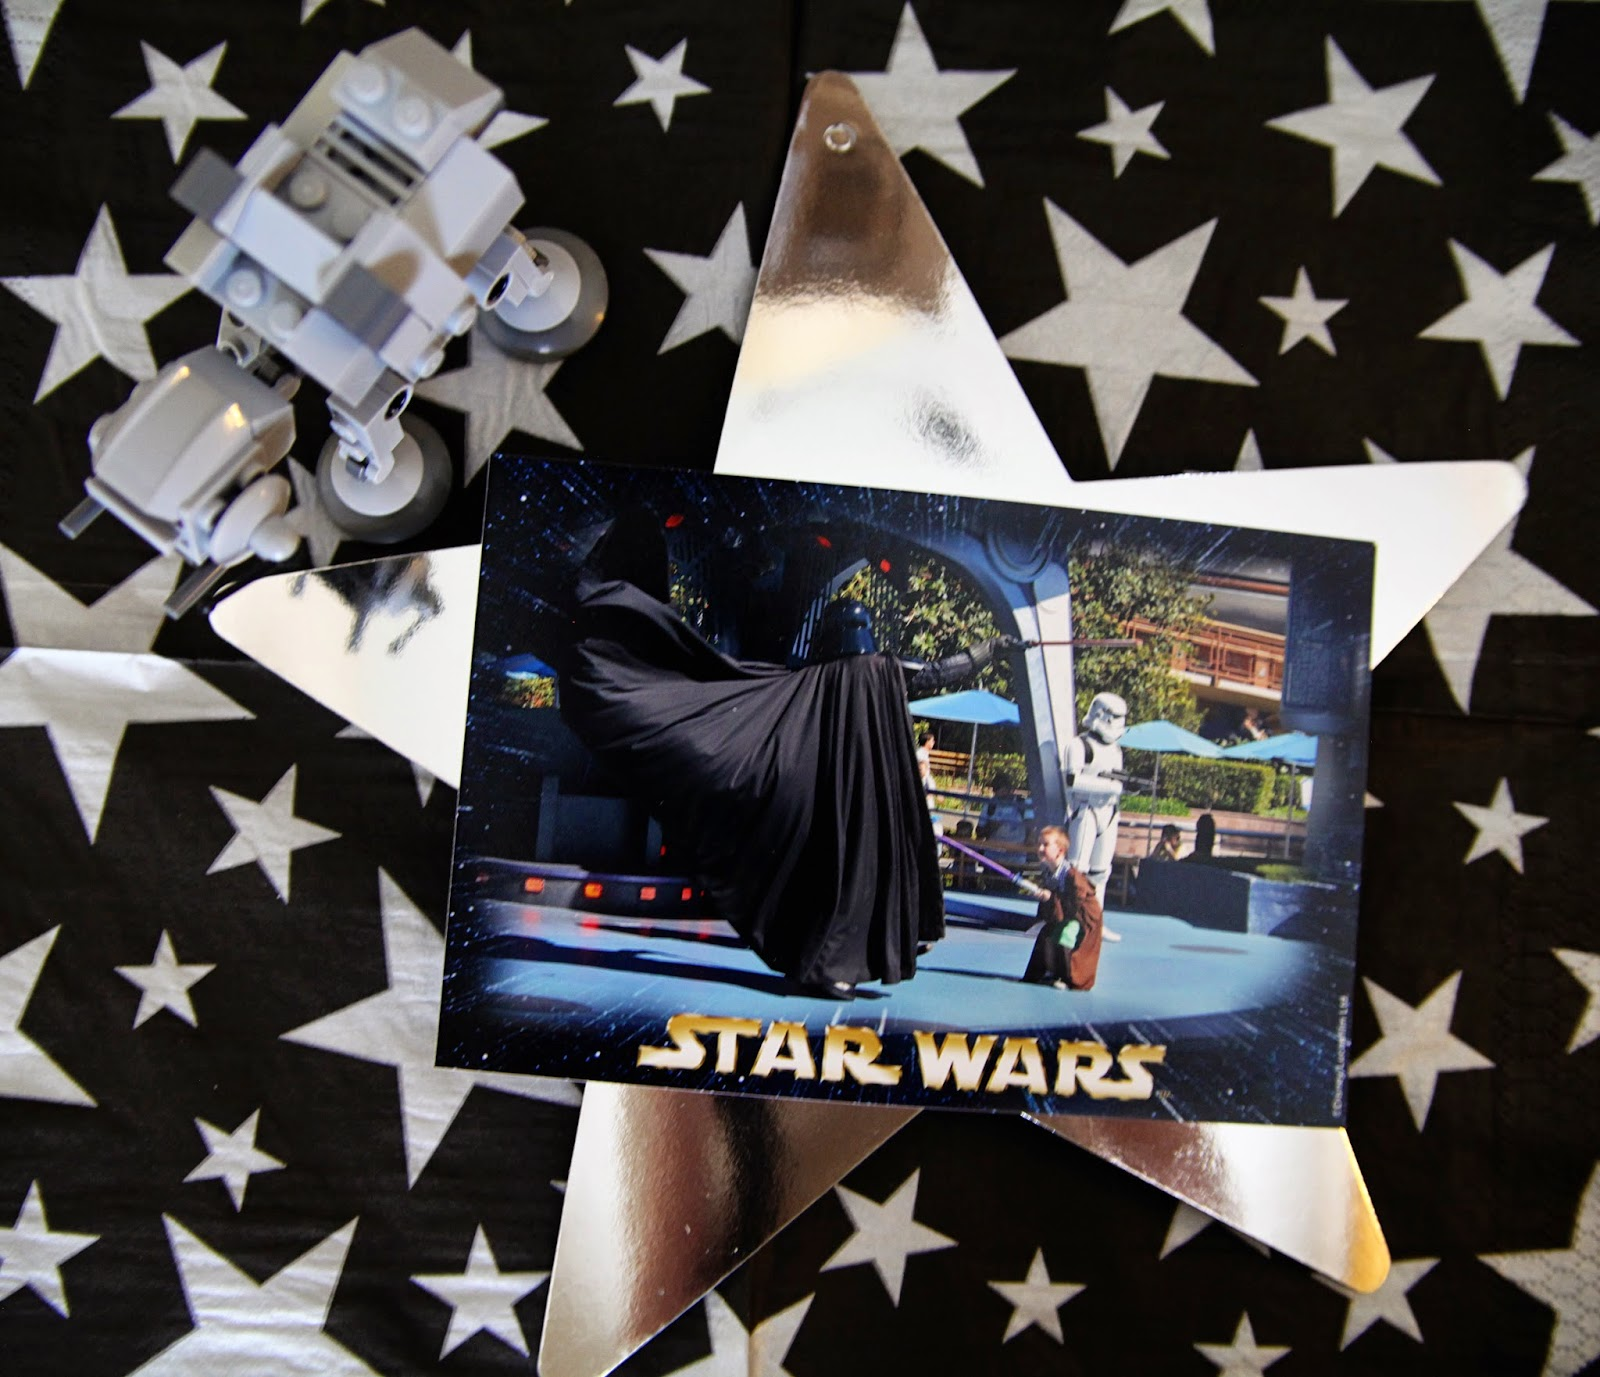 Star Wars Lego Decorations Star Wars Lego Birthday Party